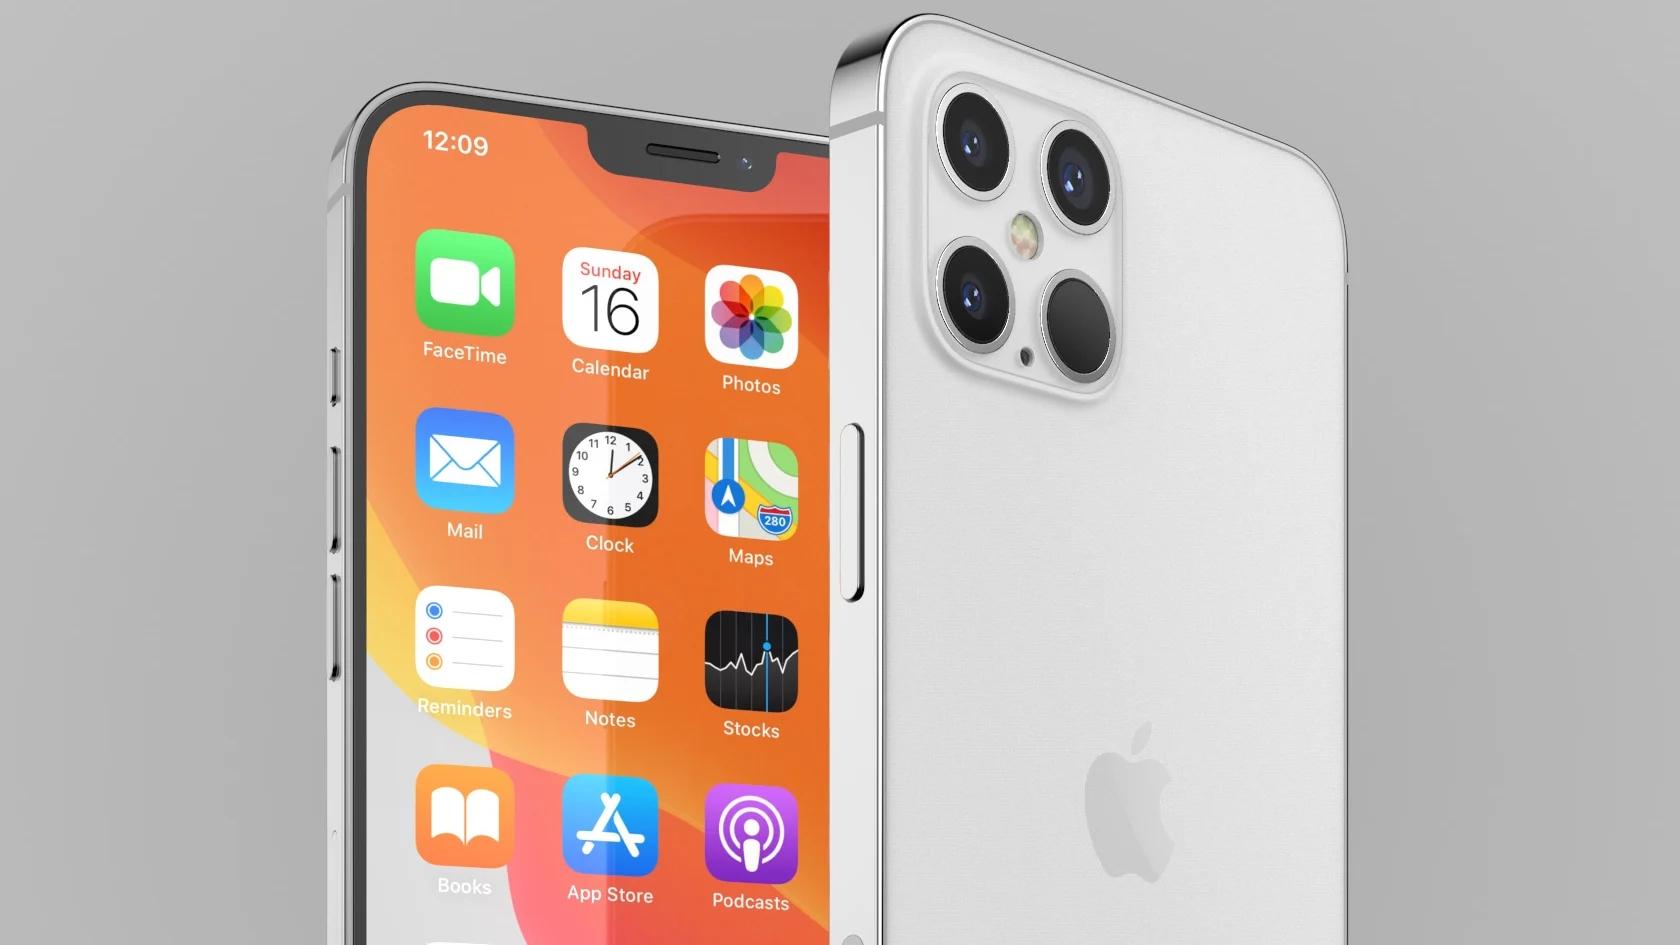 iphone-12-4k-240fps